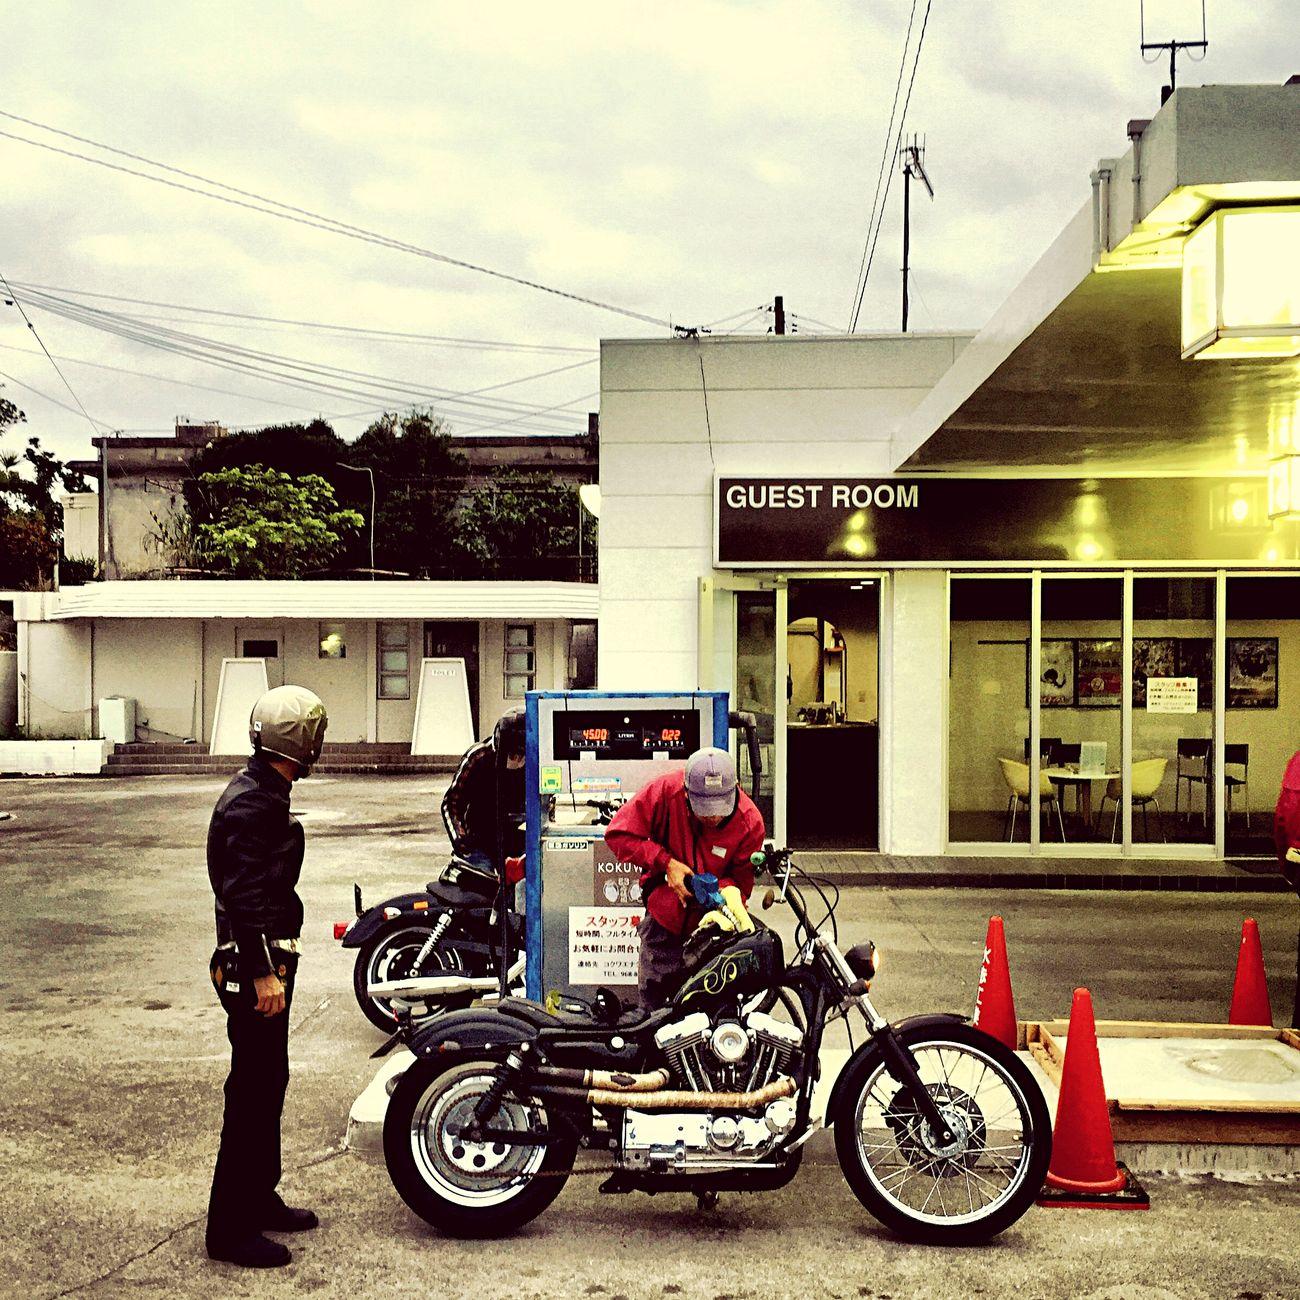 Gas charge Harleydavidson Sportster Custom Run Brotherhood Motorcycles Yanbaru Okinawa 沖縄 Bikers